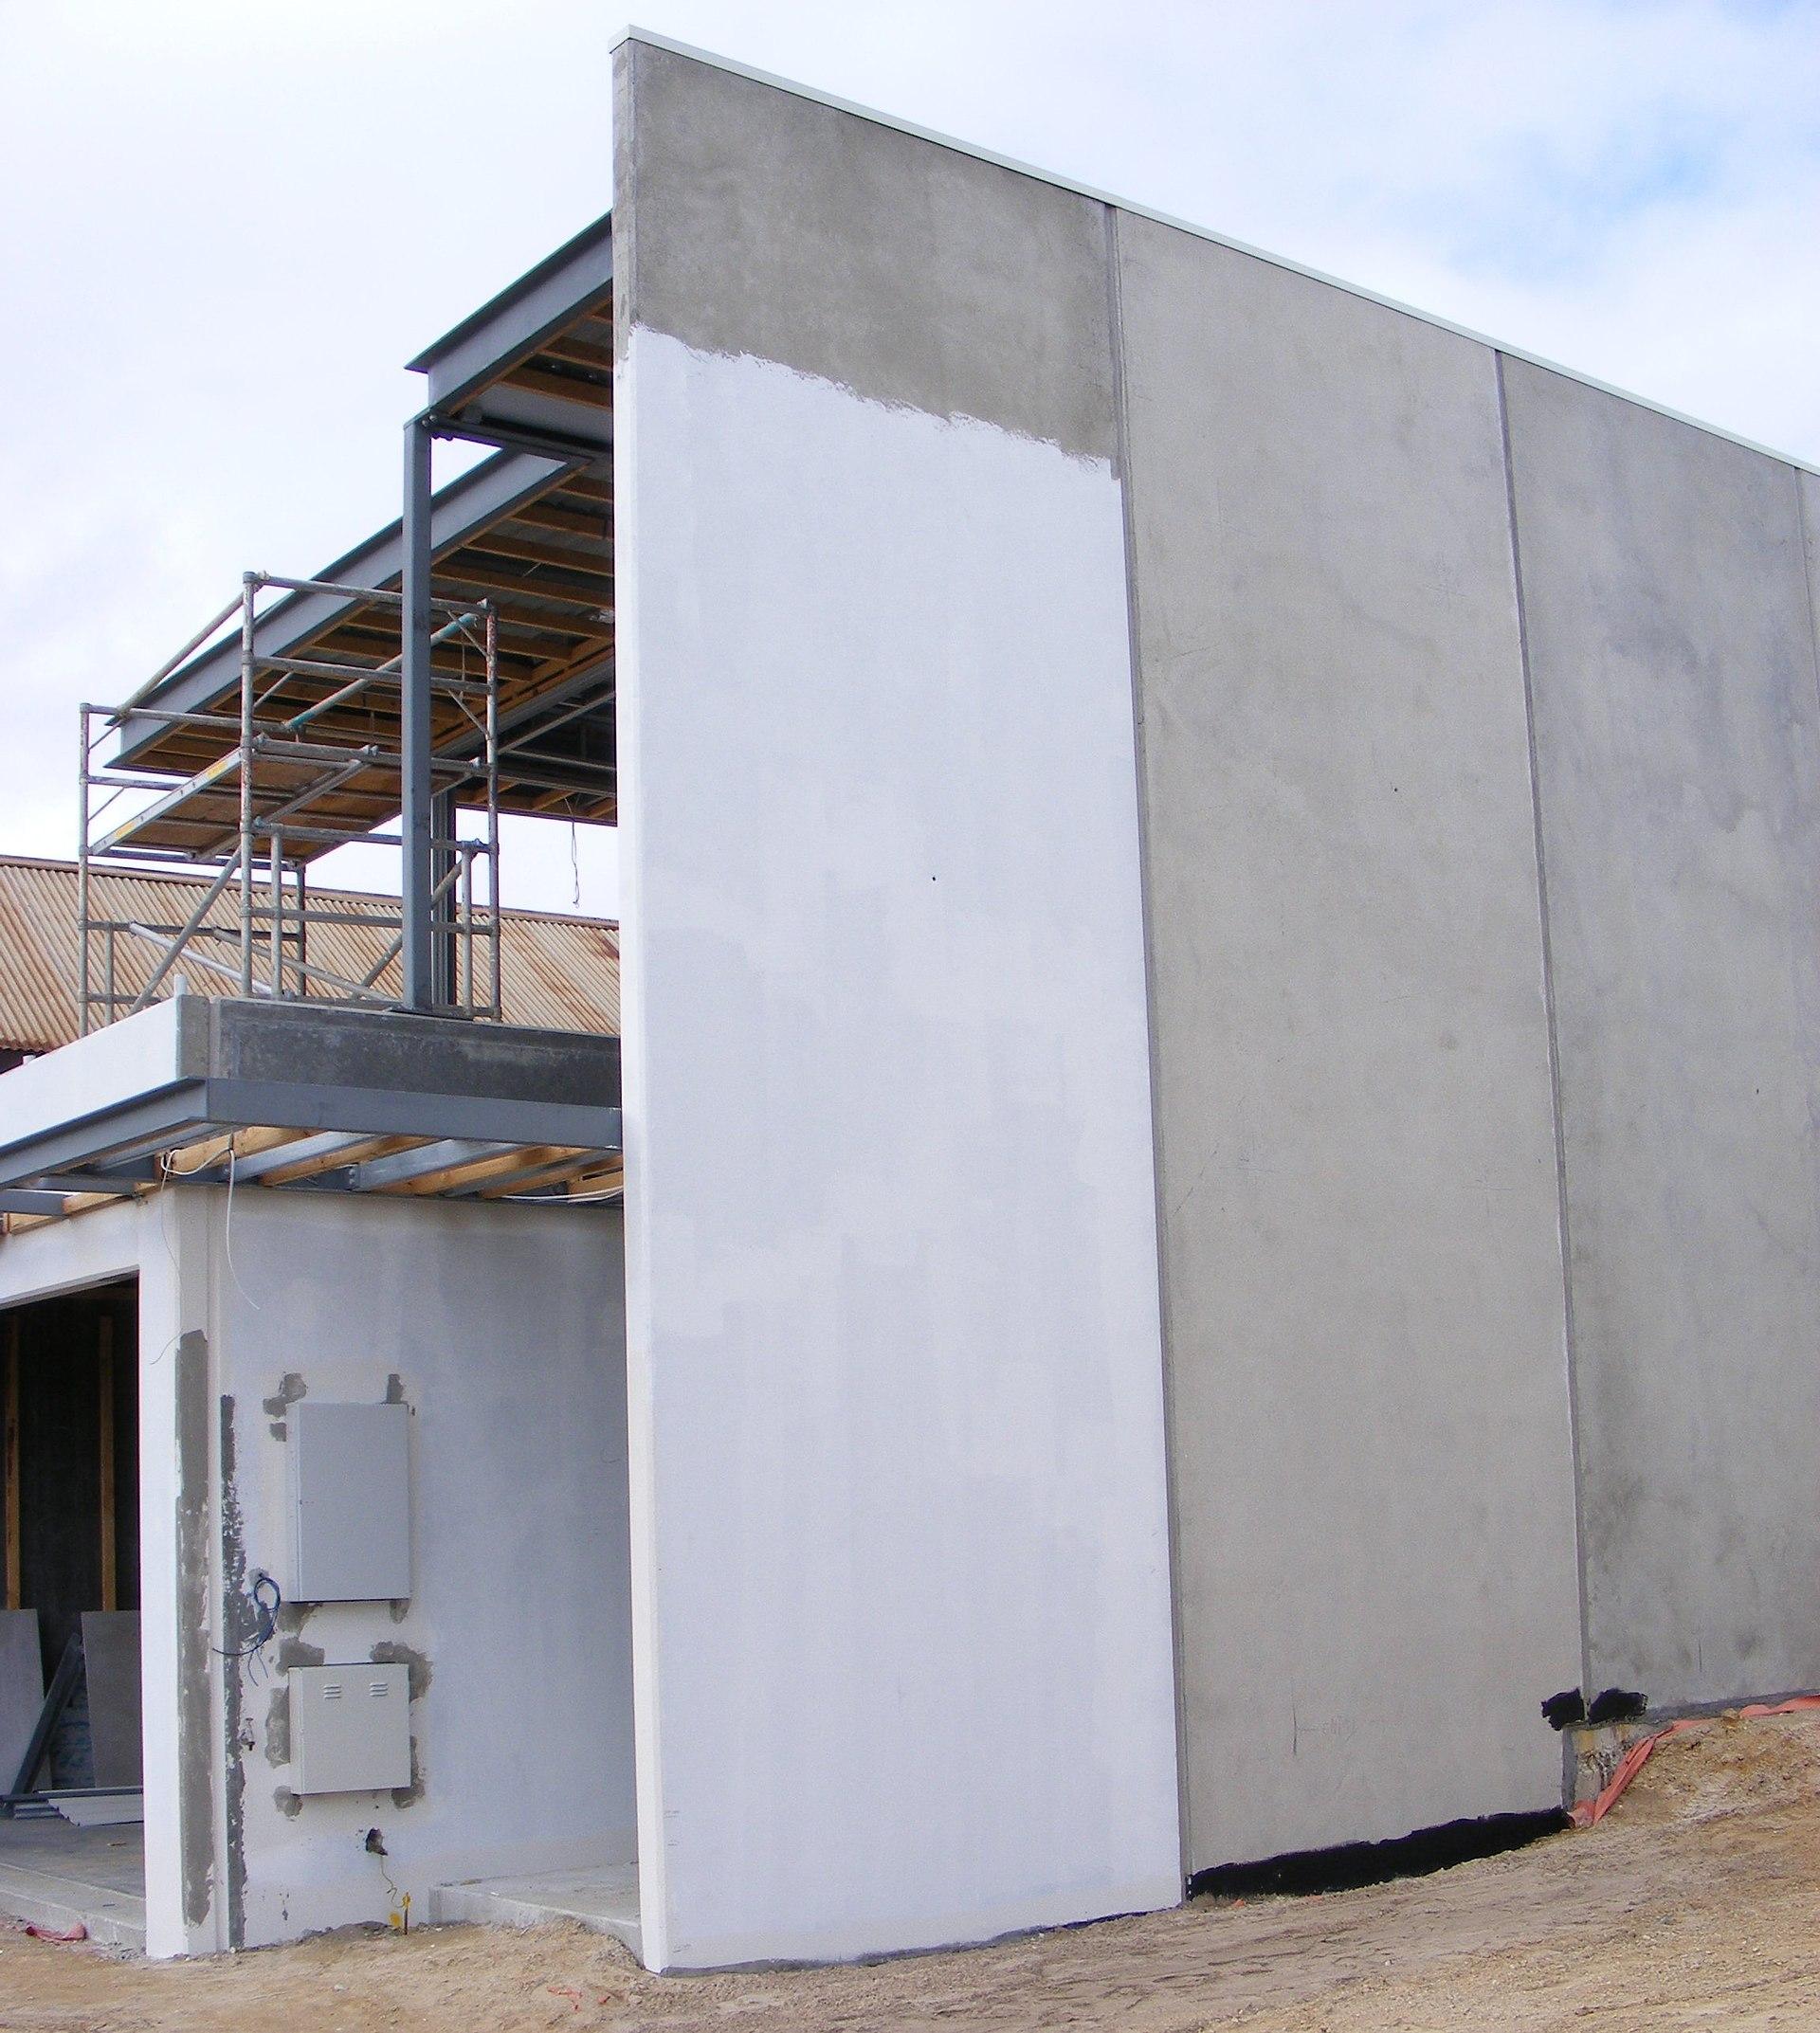 Precast/Prestress Concrete